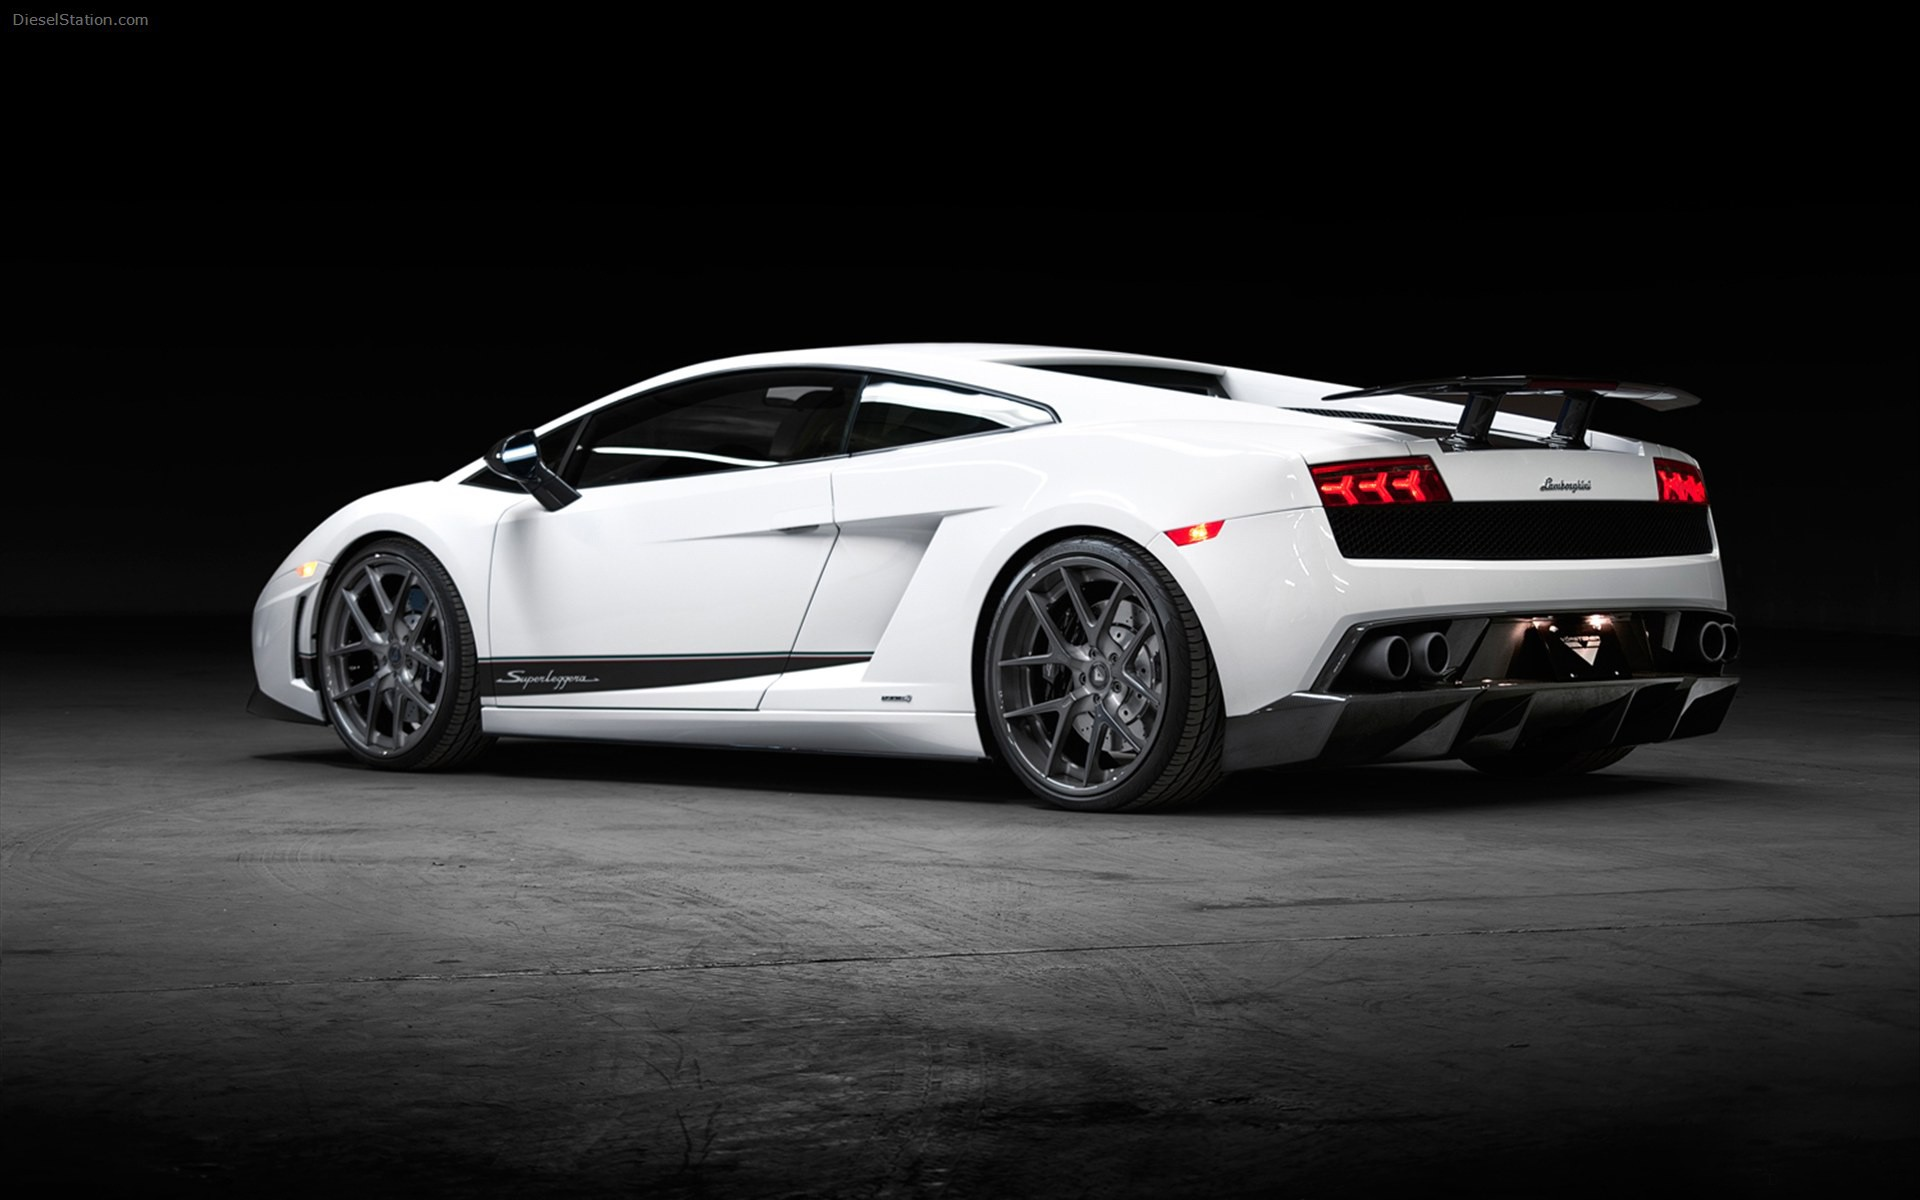 Bugatti Hd Wallpapers Free Download Vorsteiner Lamborghini Gallardo 2012 3 Wallpaper Hd Car